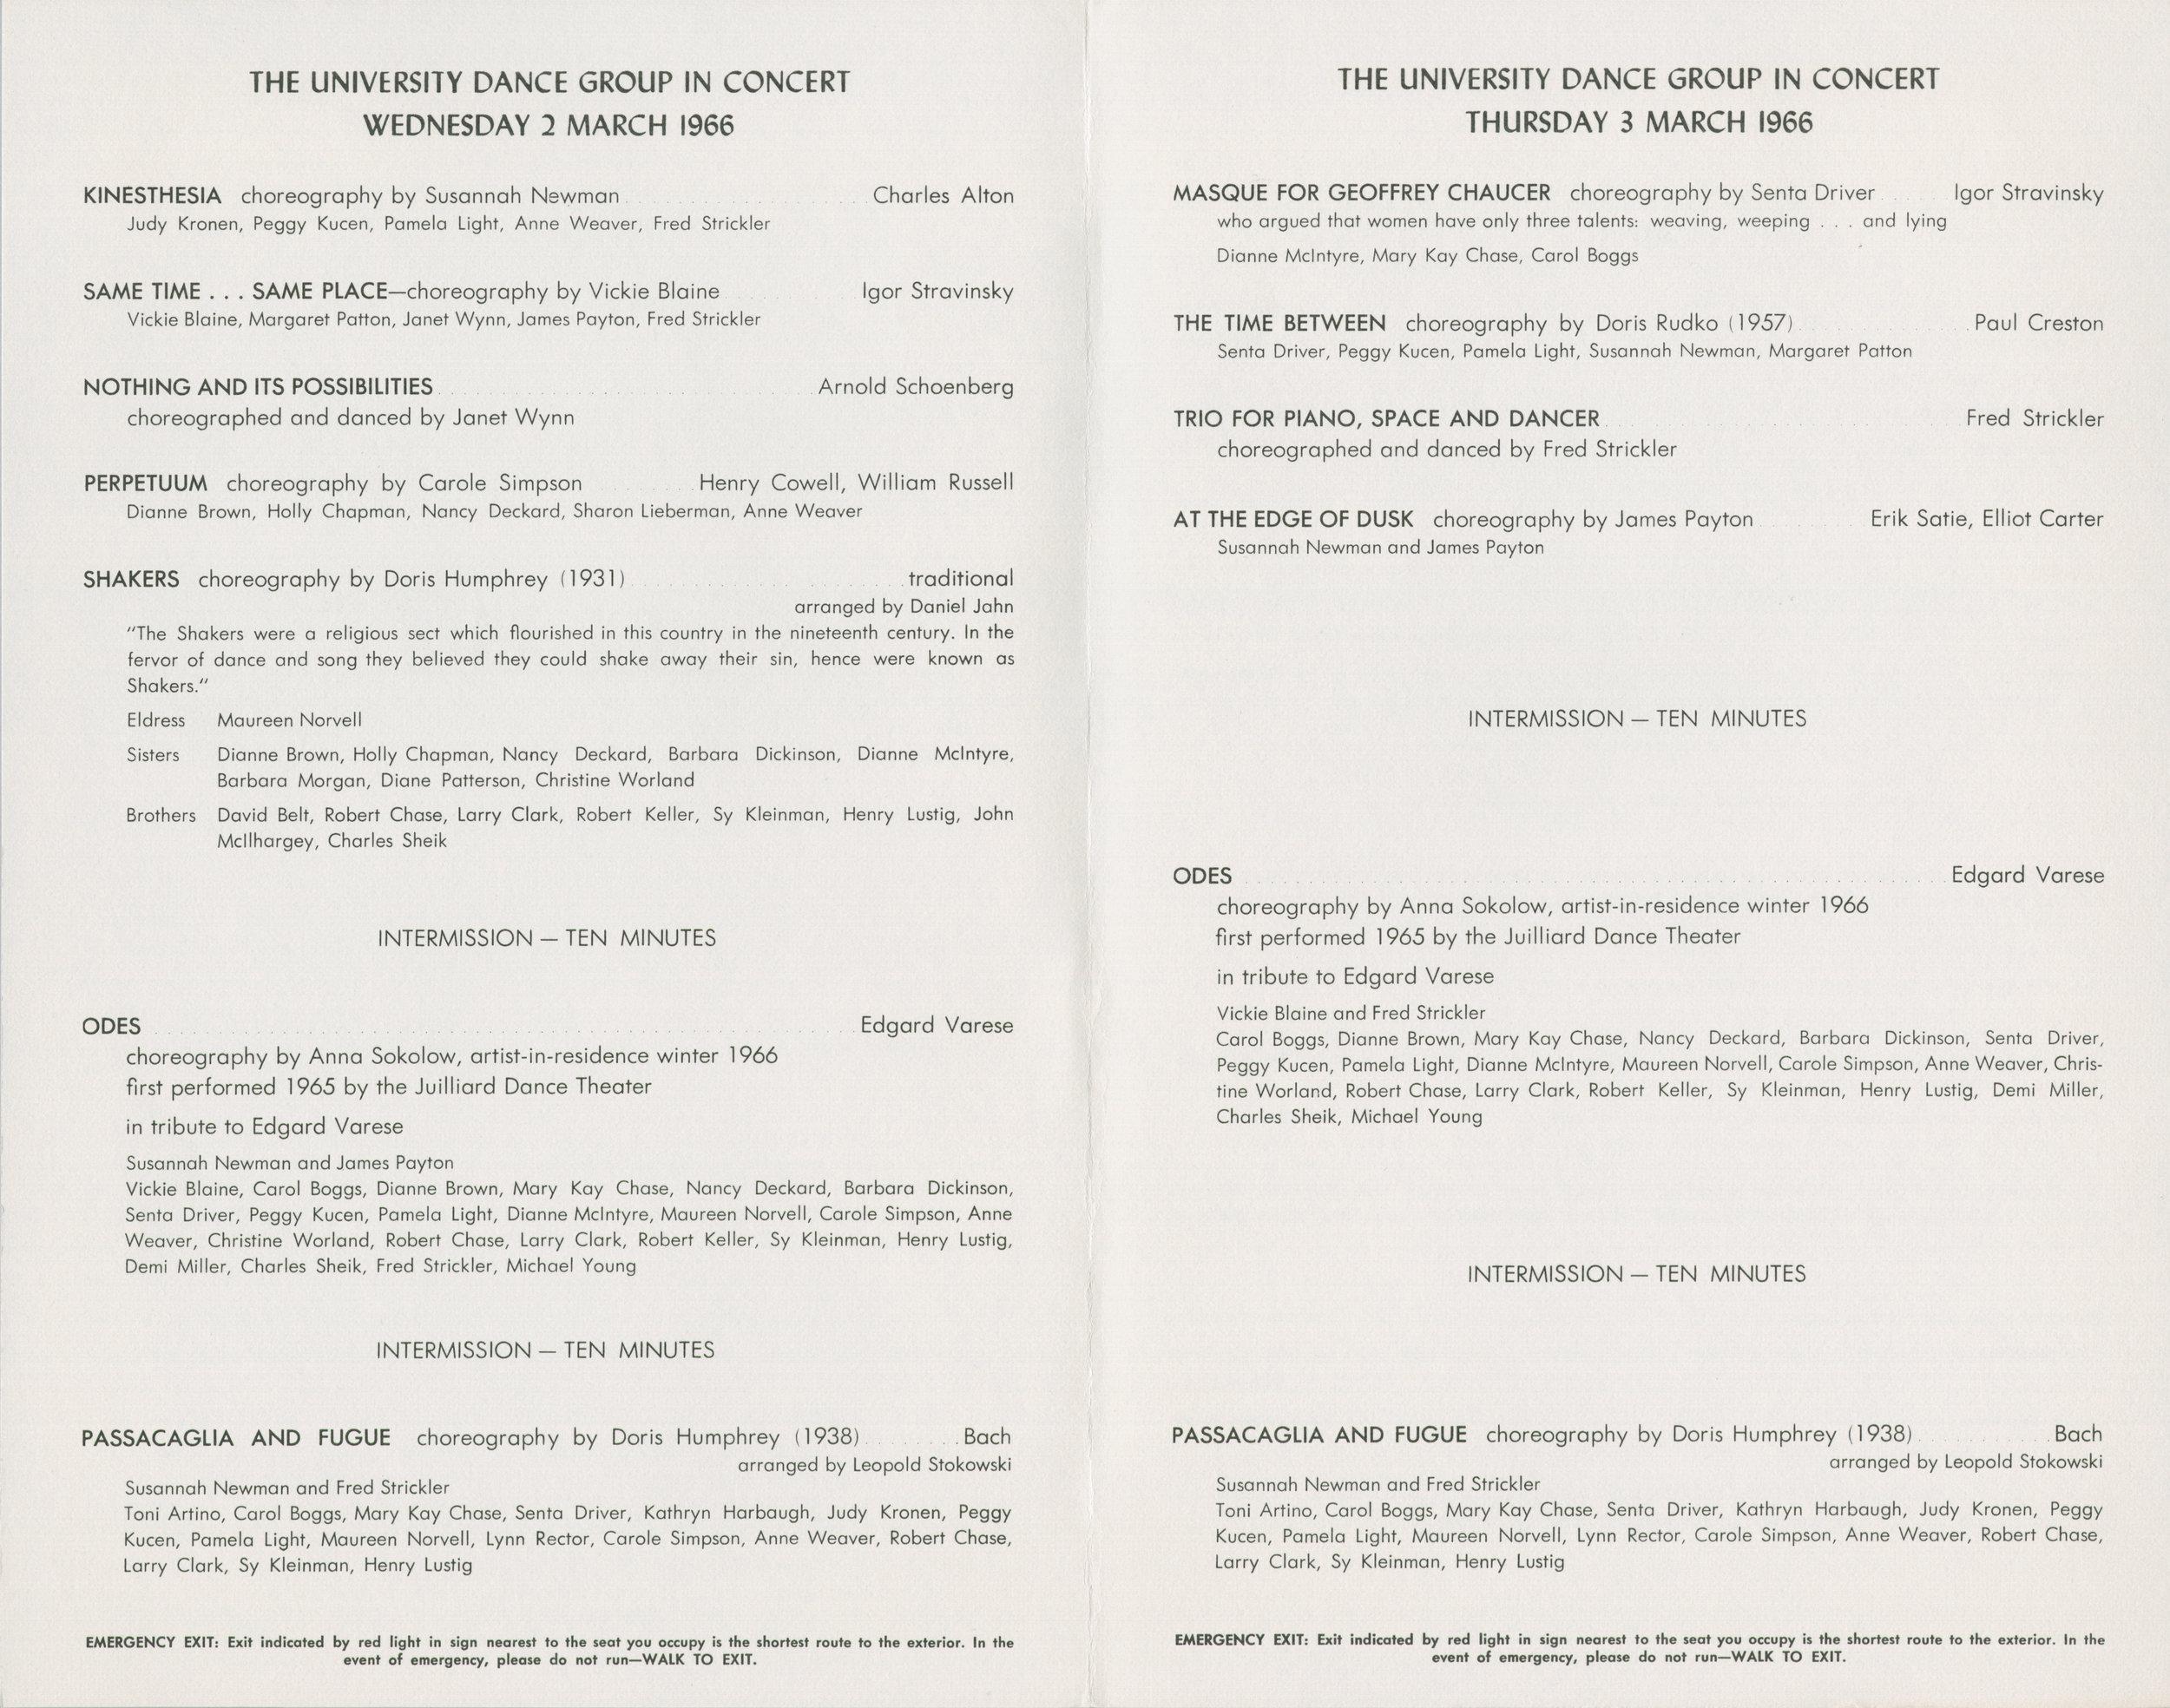 UDG_1966_DancePrograms-019-002.jpg